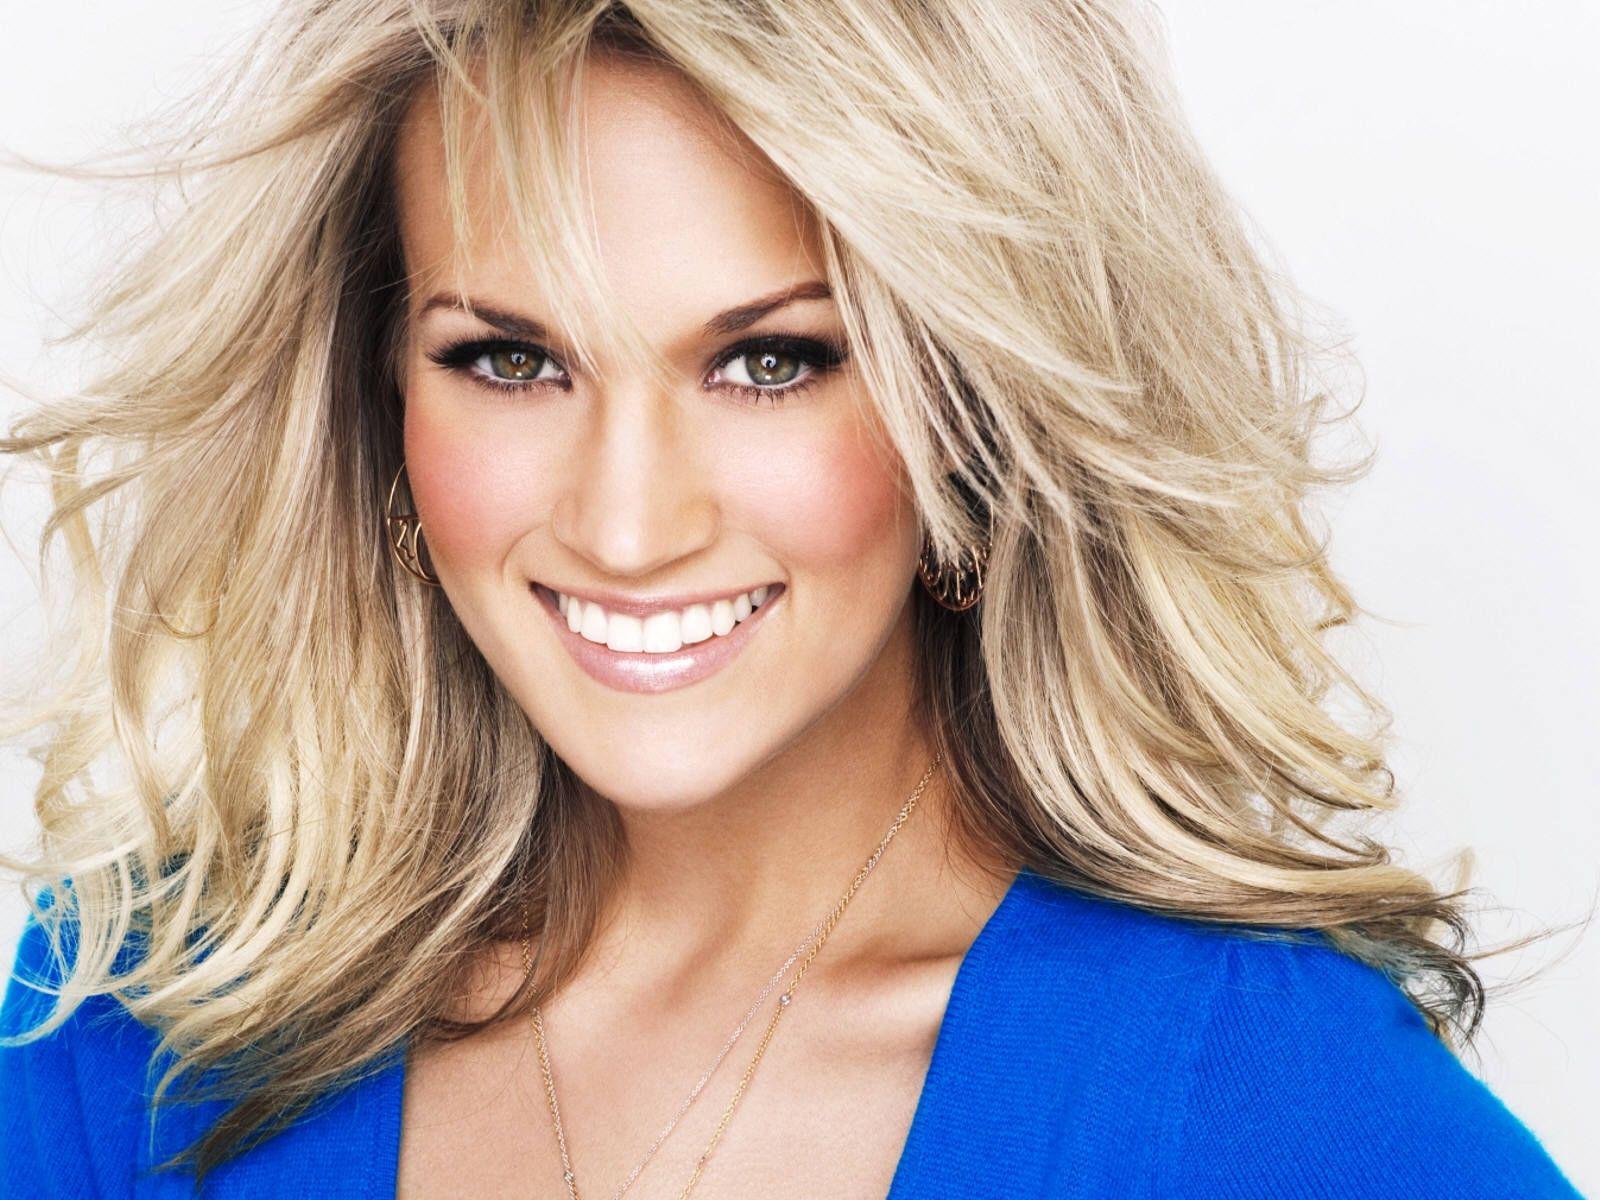 Carrie Underwood Carrie underwood hair, Hair styles, Hair